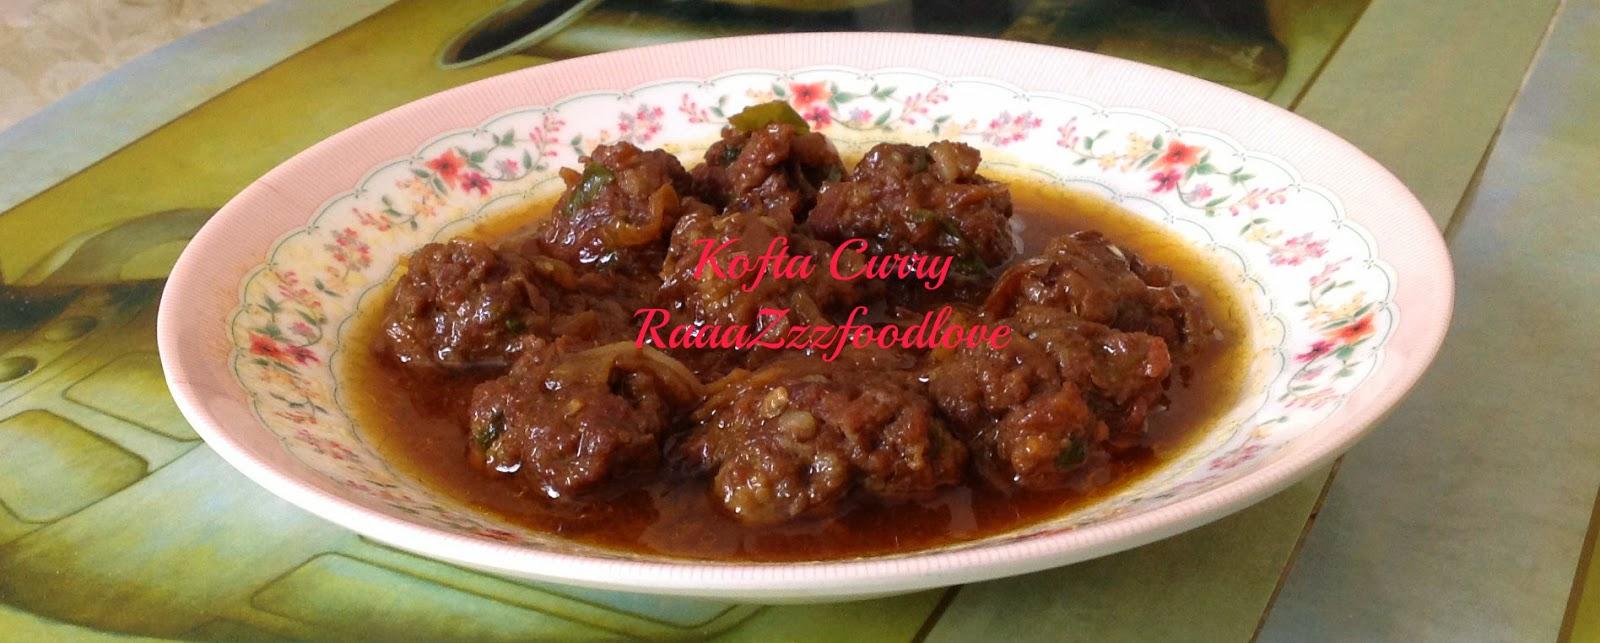 http://raaazzzfoodlove.blogspot.in/2013/08/kofta-curry.html